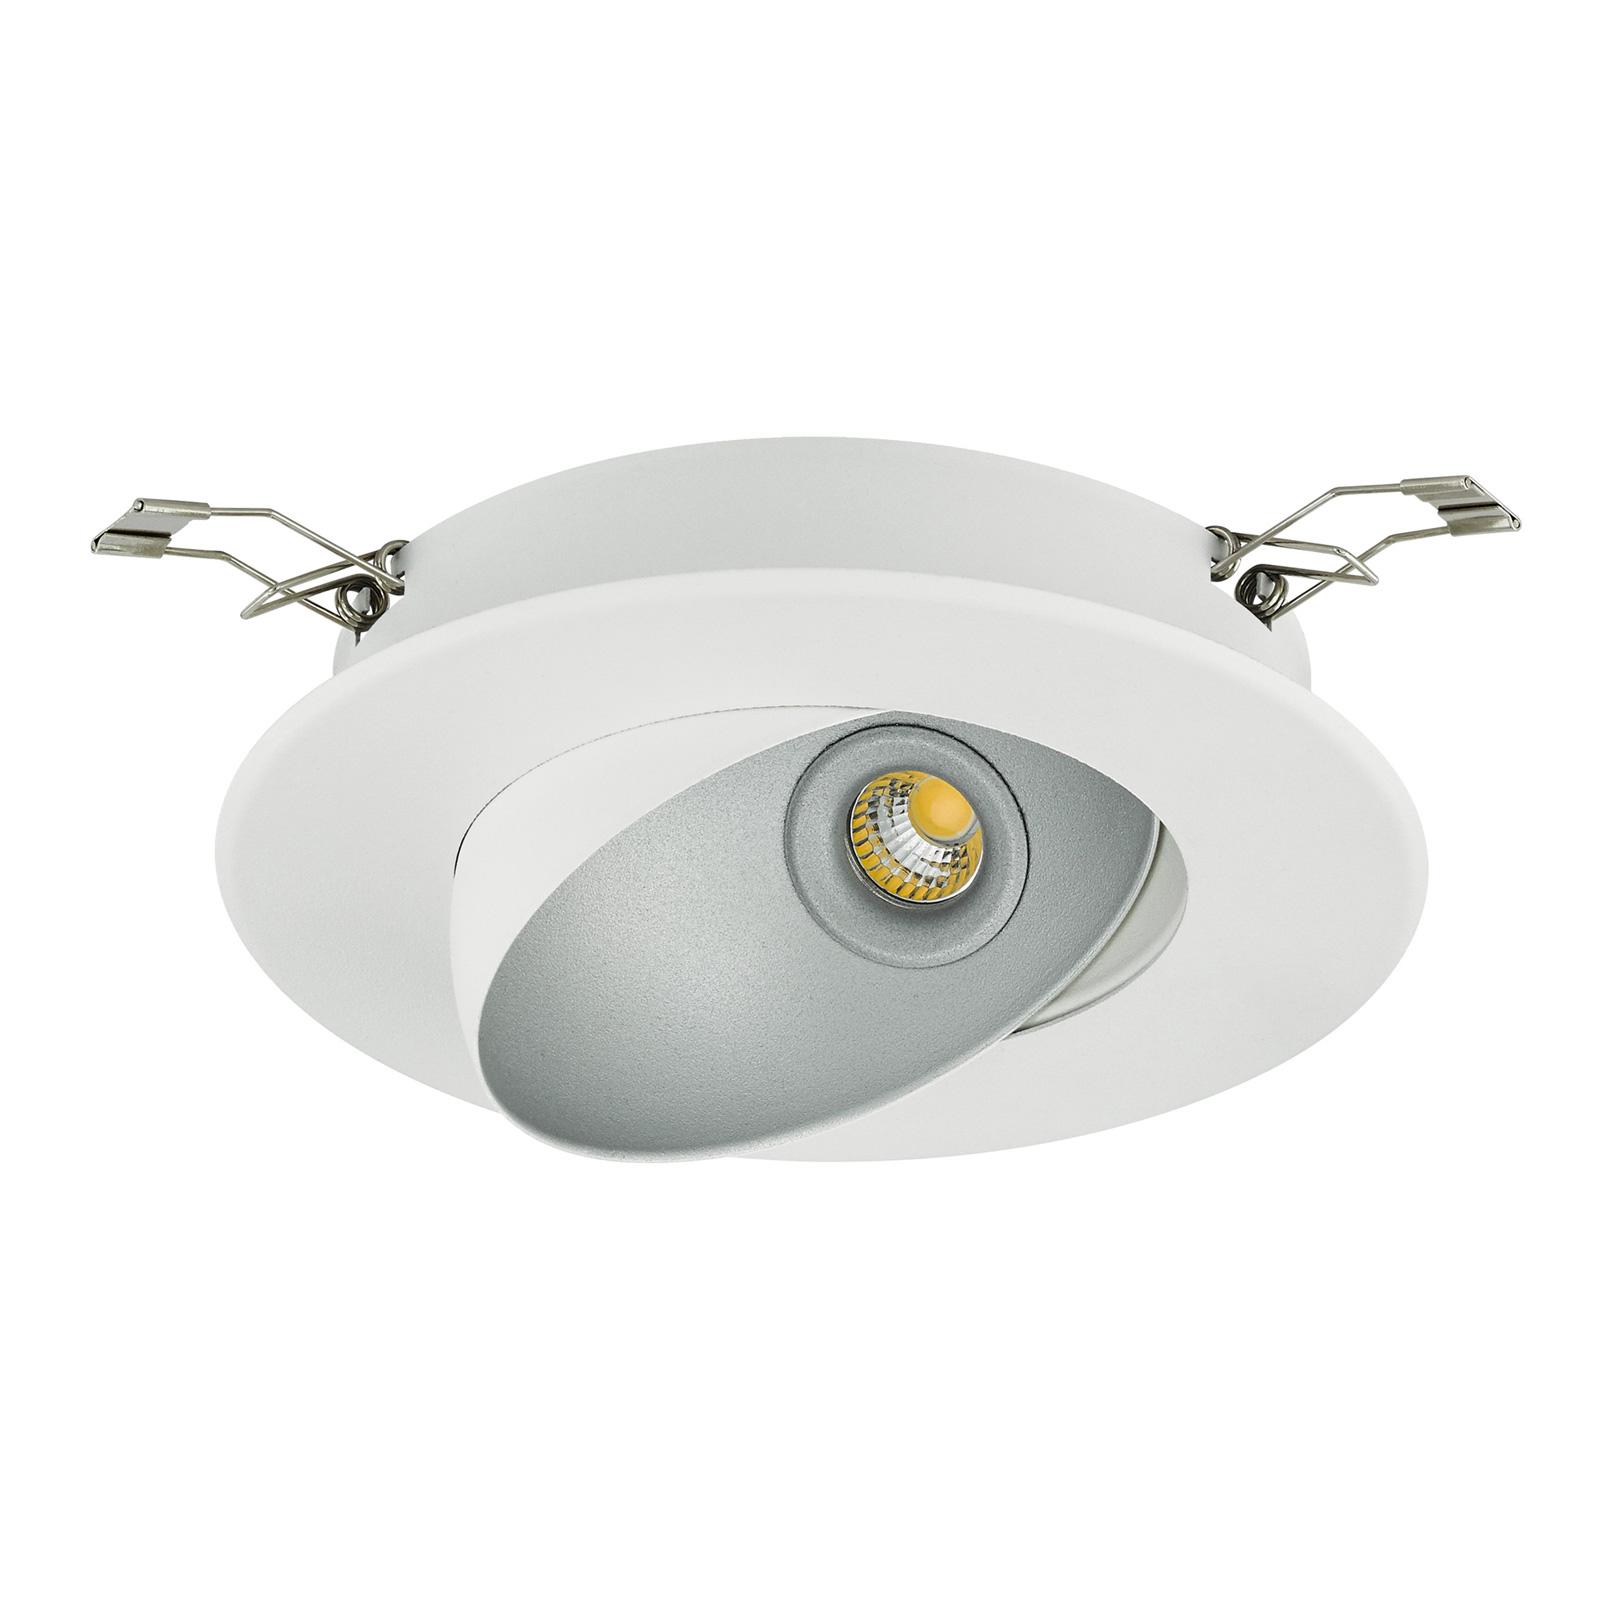 LED inbouwspot Ronzano 1 wit-zilver